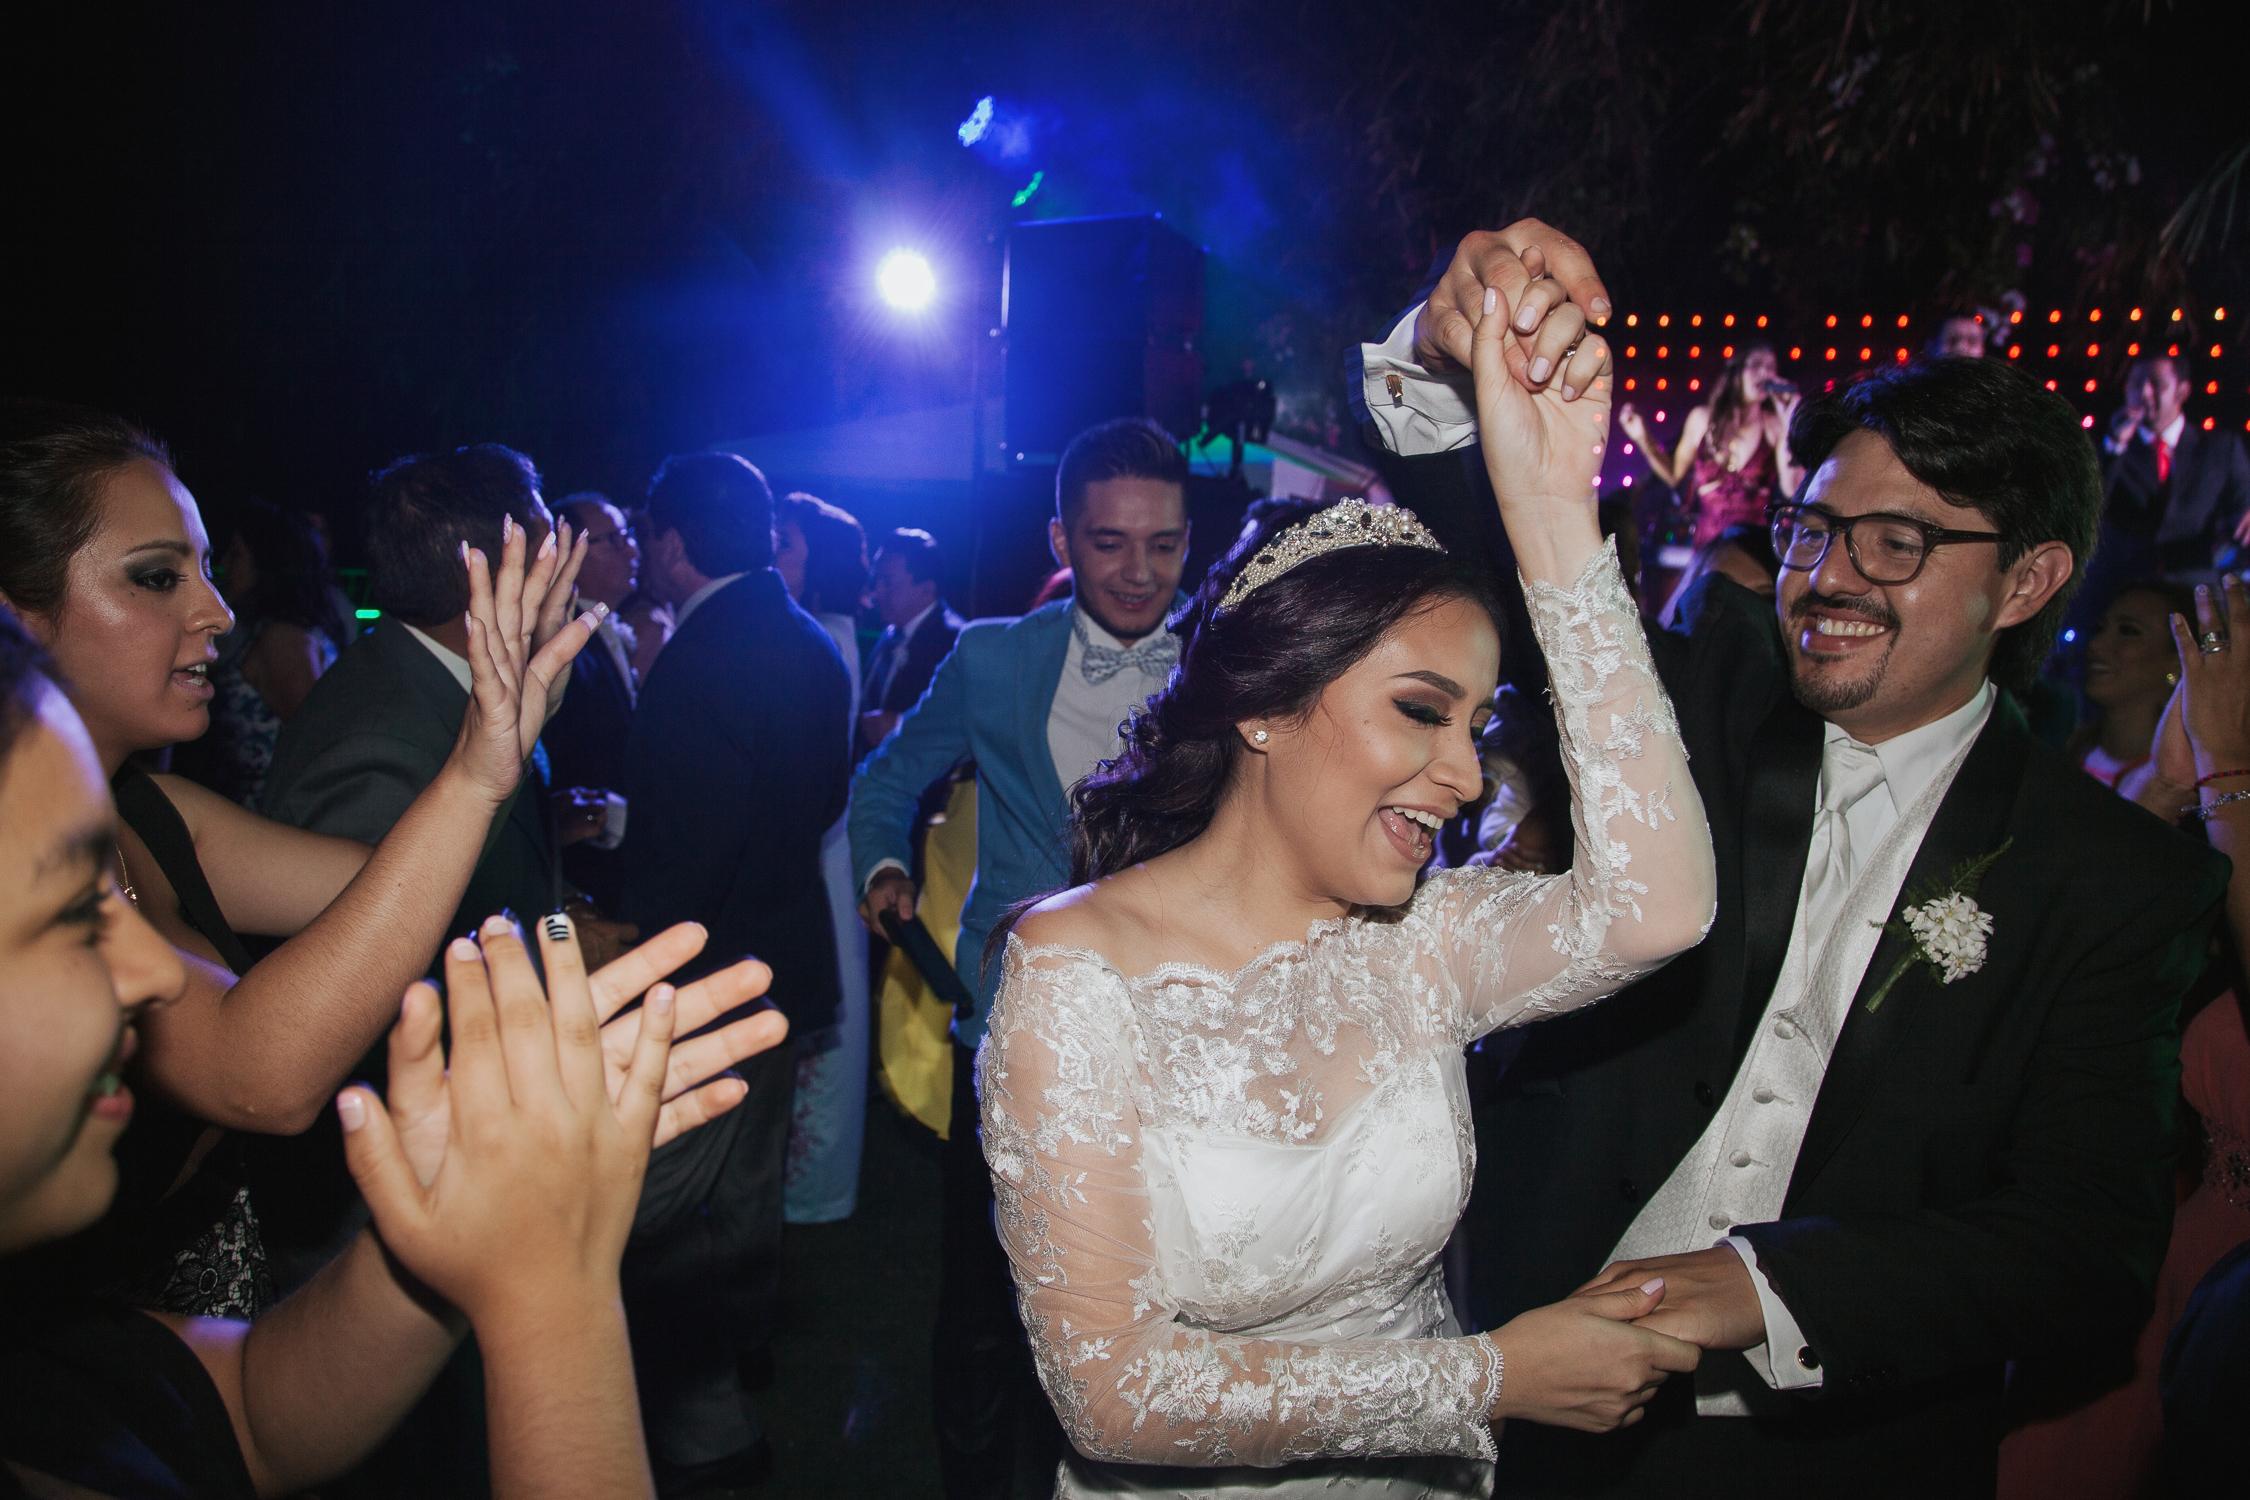 Michelle-Agurto-Fotografia-Bodas-Ecuador-Destination-Wedding-Photographer-Pauli-Edwin-39.JPG